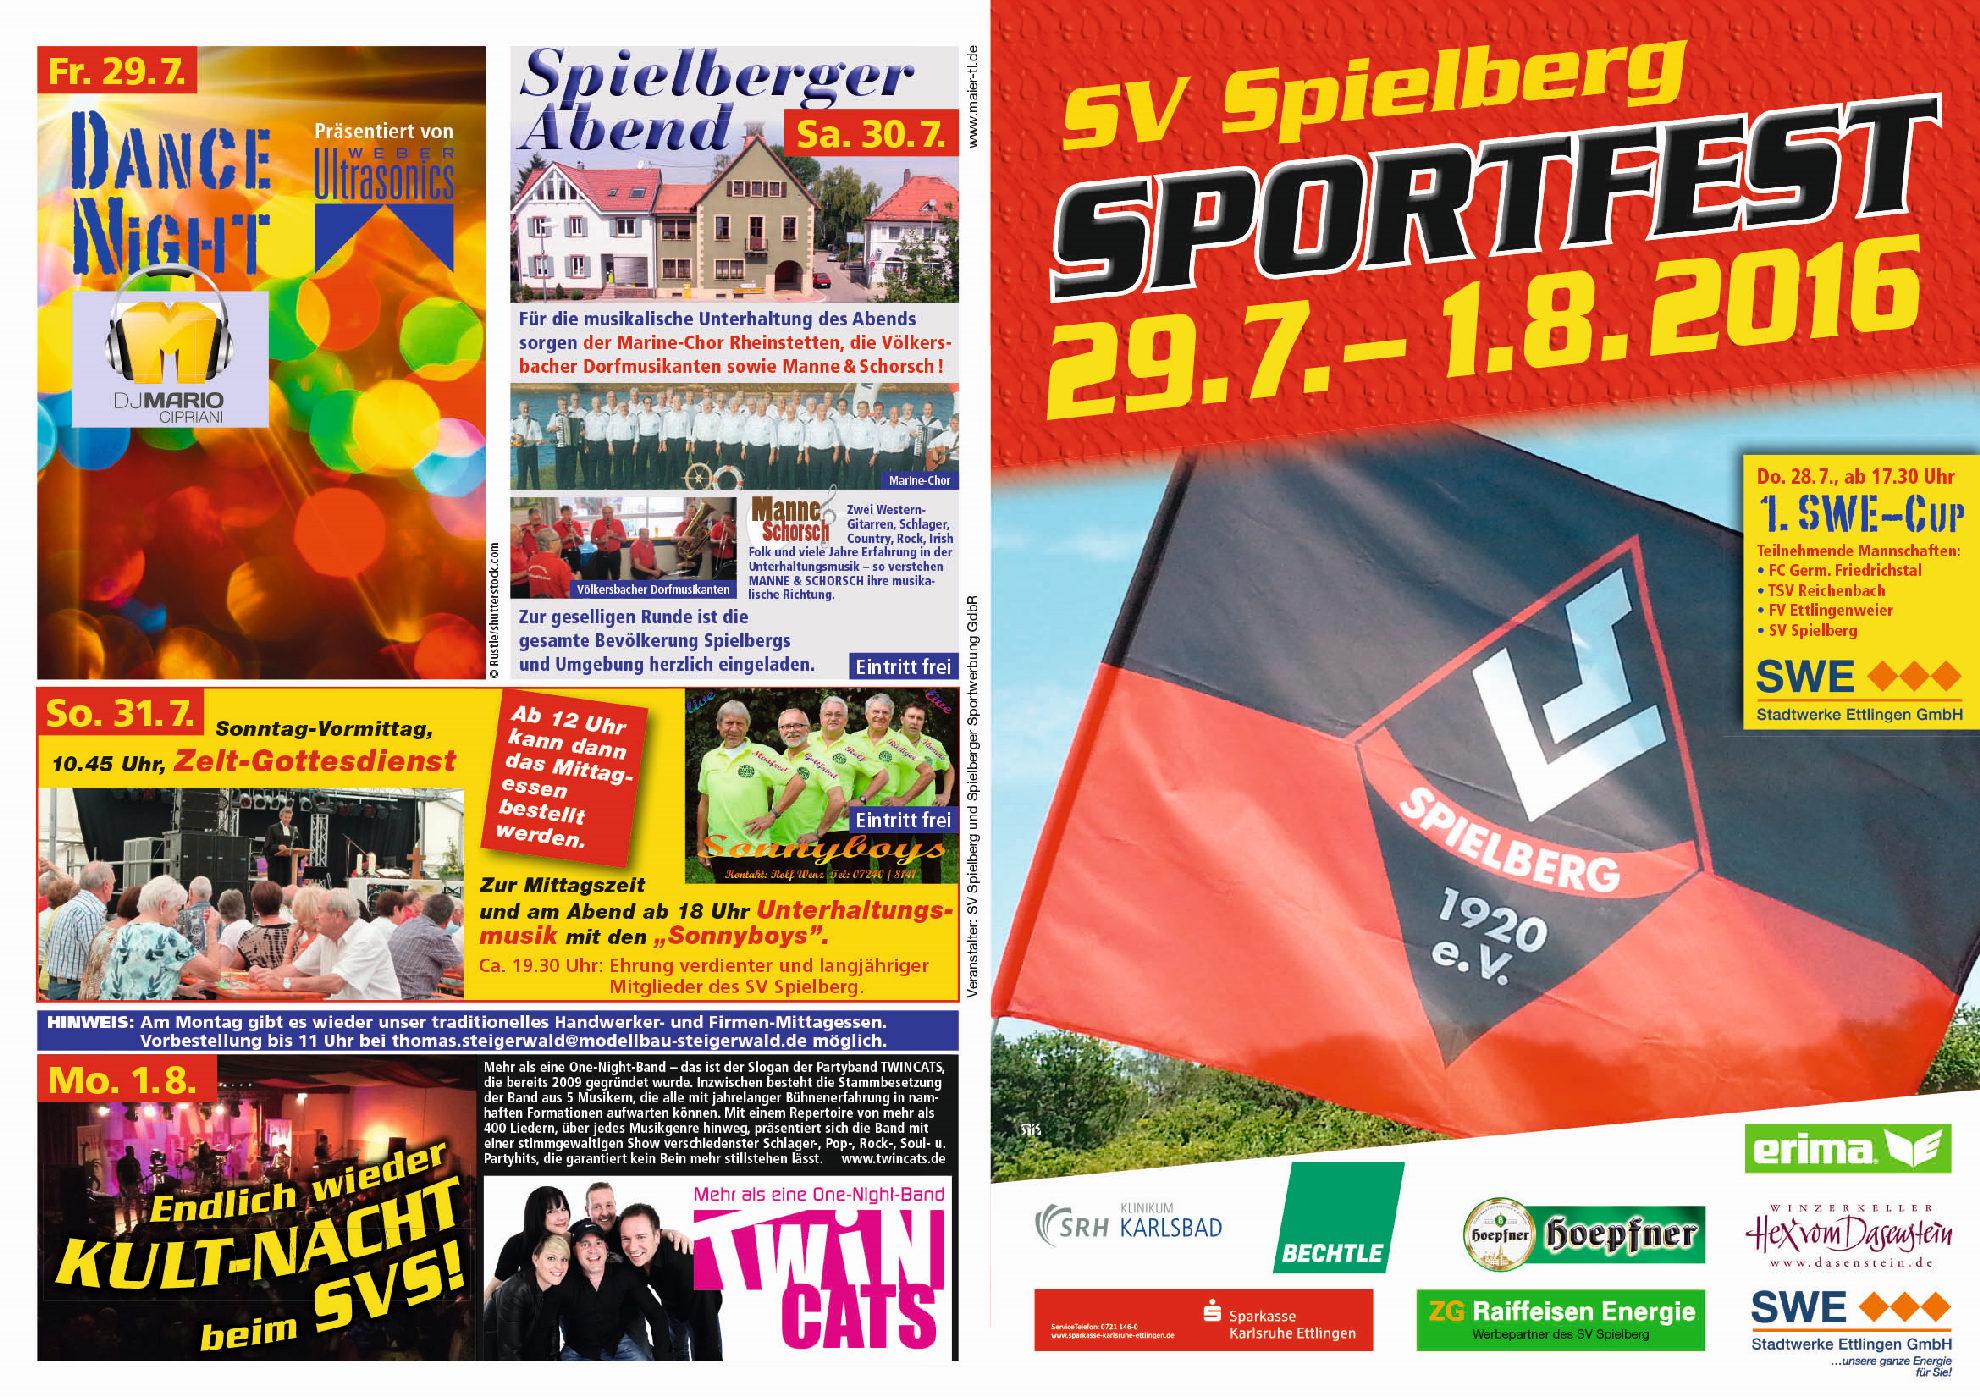 http://sv-spielberg1920.de/wp-content/uploads/2016/06/Einladung_Sportfest_SVS_2016_4c-1.jpg